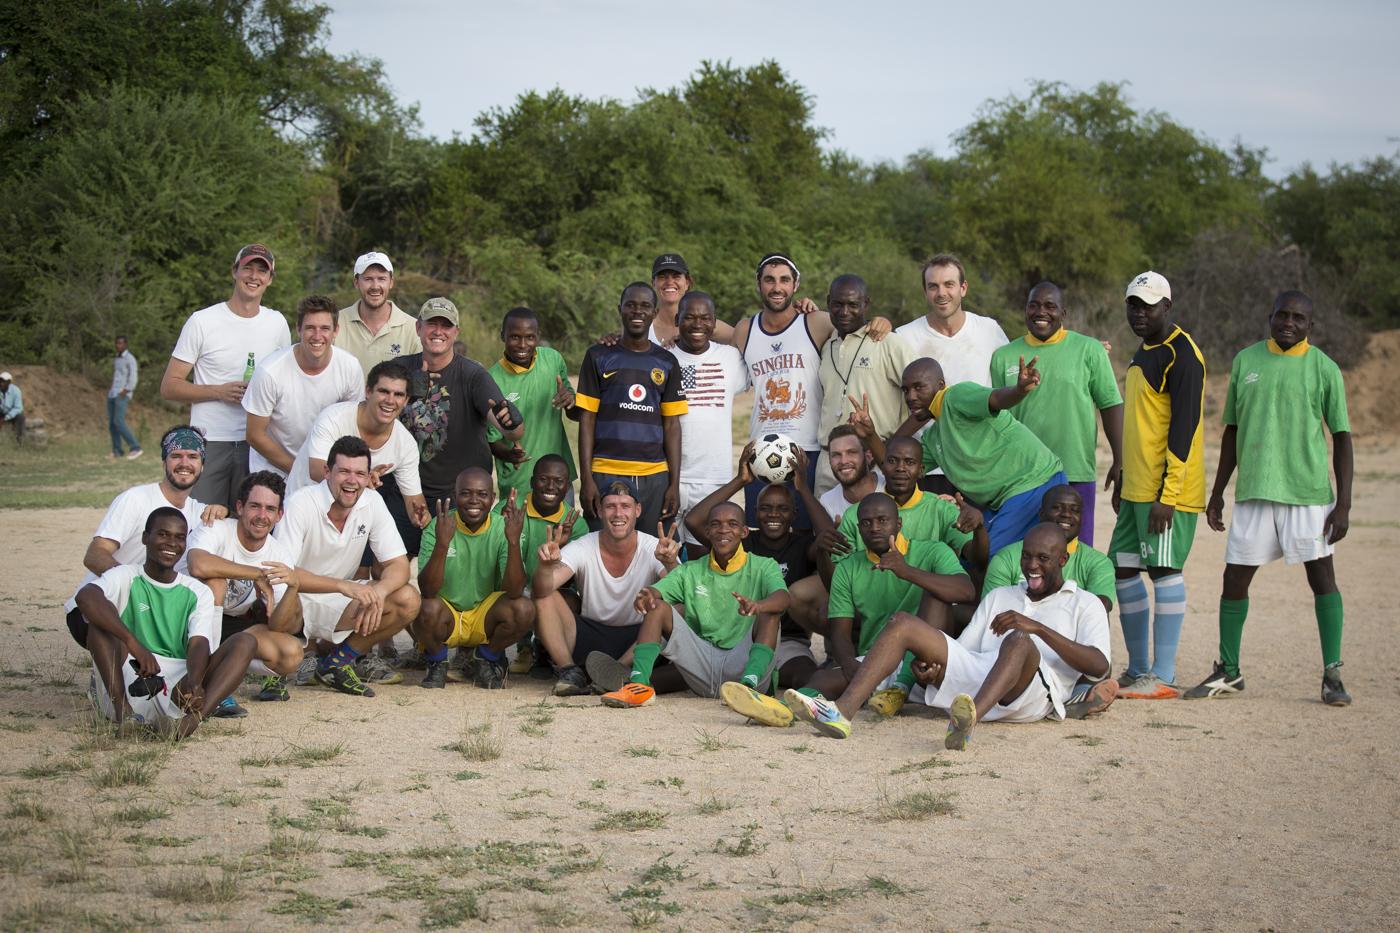 Teams Soccer